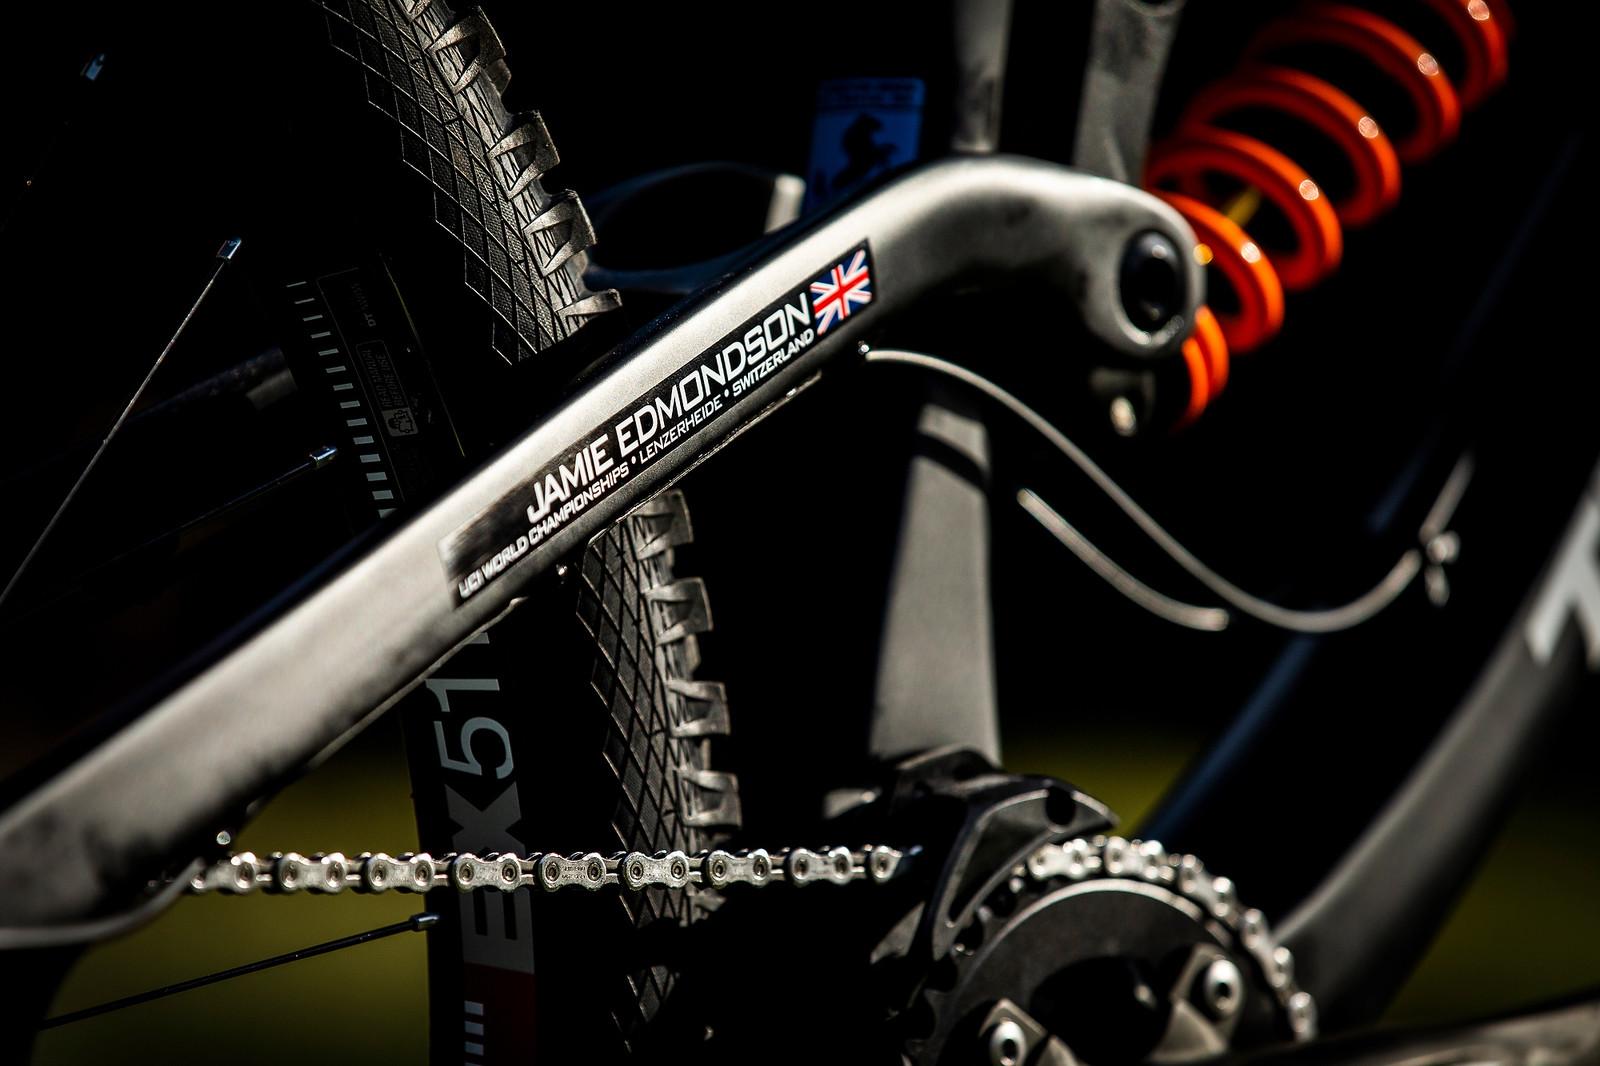 Your Name in Neon - WORLD CHAMPS BIKE - Jamie Edmondson's Transition TR11 - Mountain Biking Pictures - Vital MTB